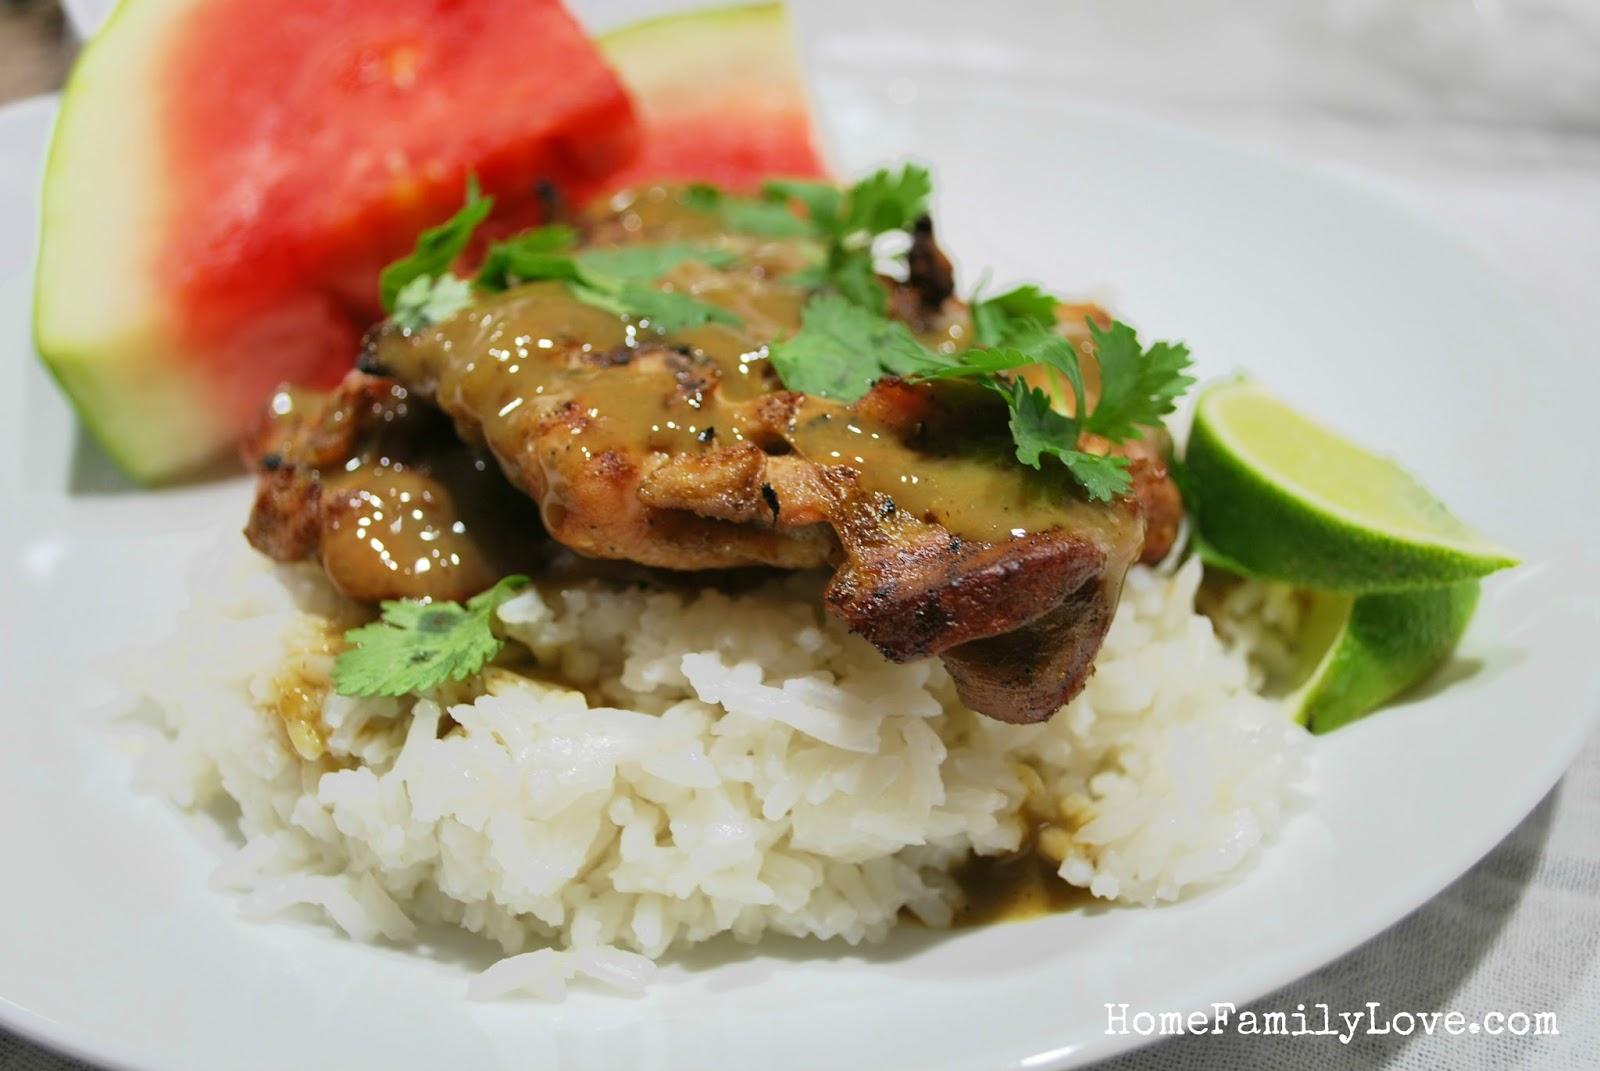 Homefamilylove Healthy Recipes Inspiration Grilled